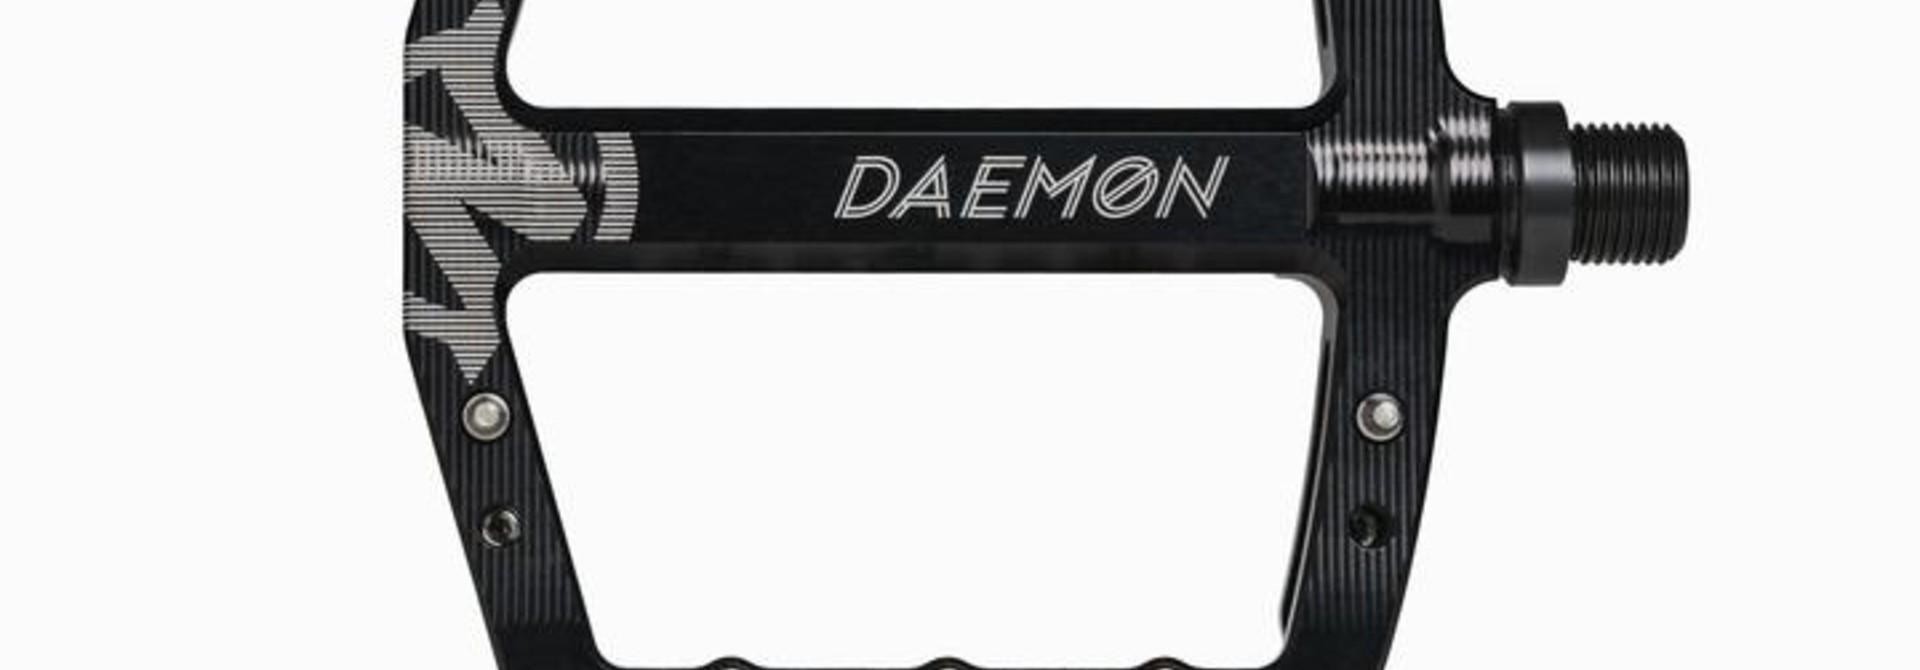 NSB x Yoann Barelli Daemon Pedals - Black